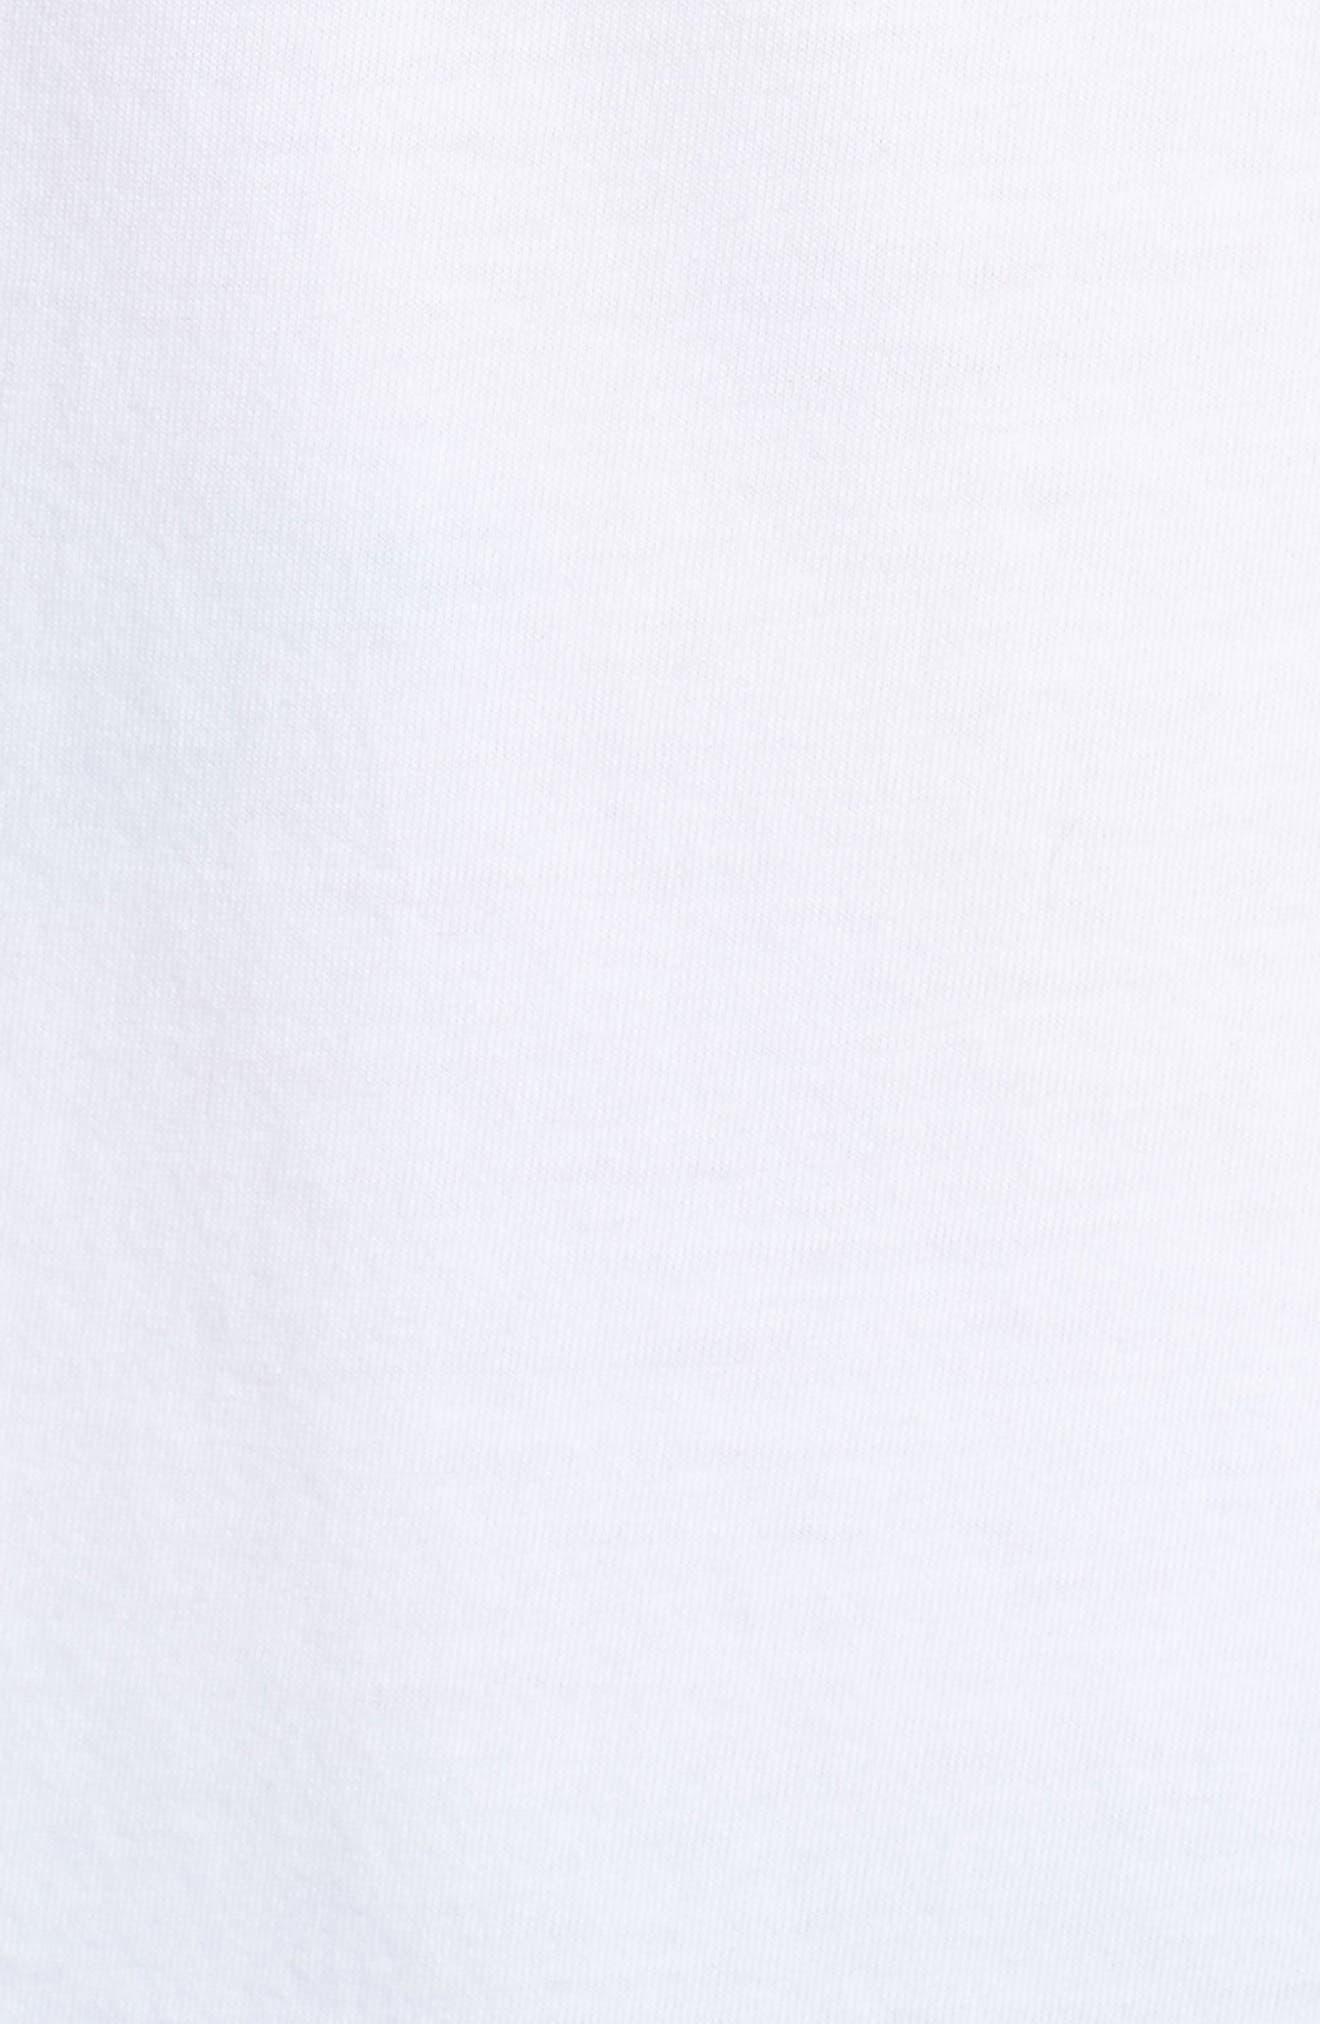 T-Just-SW T-Shirt,                             Alternate thumbnail 5, color,                             100